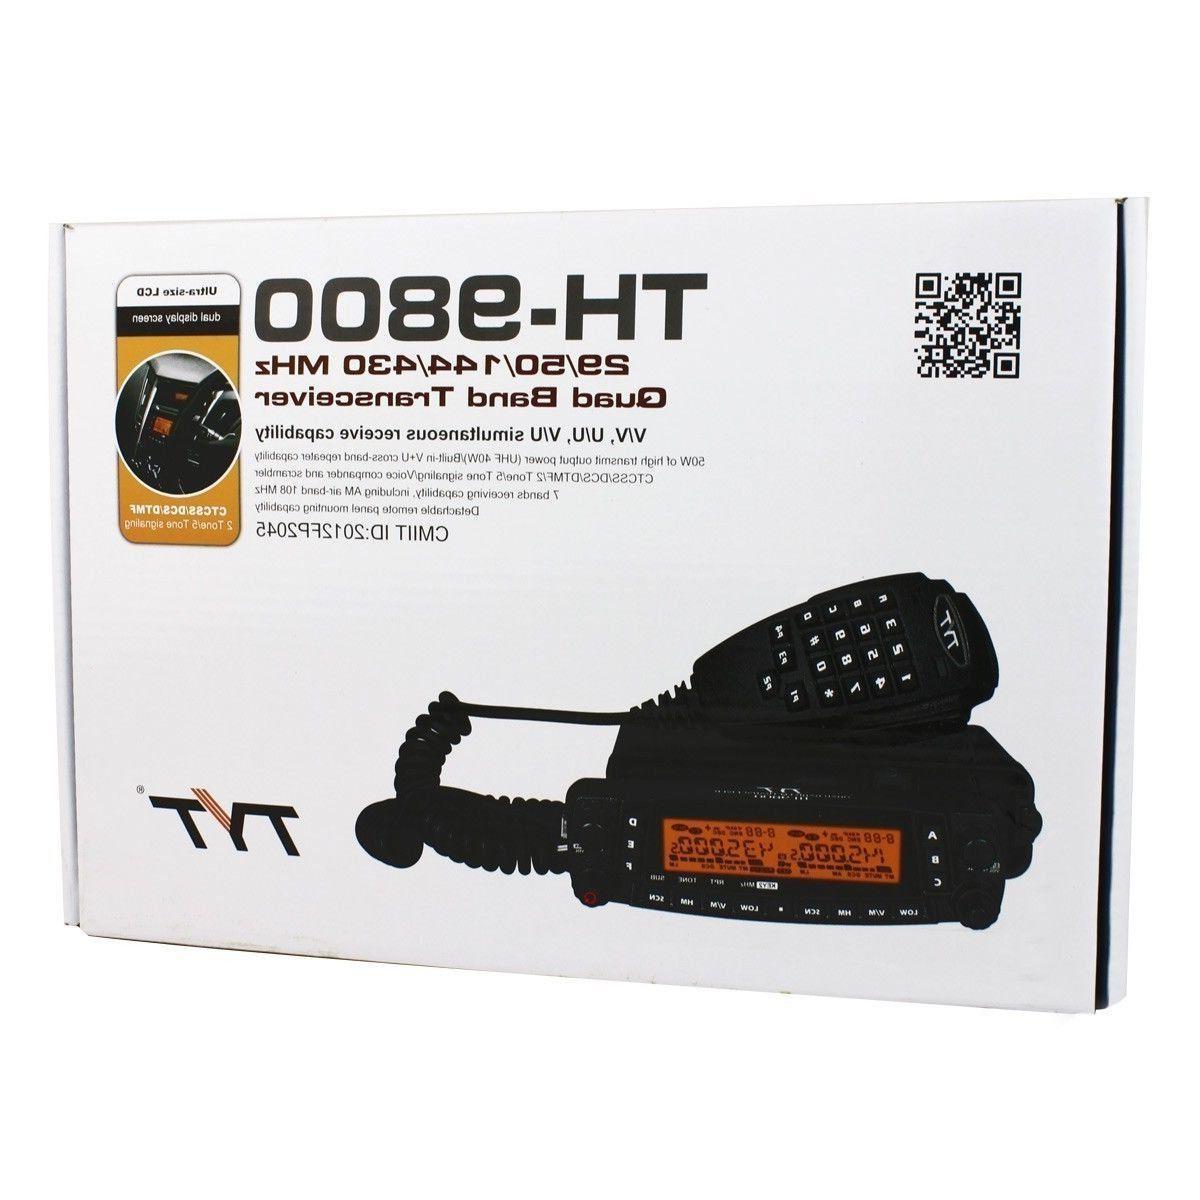 TYT TH-9800 plus 29/50/144/430 MHZ QUAD BAND TRANSCEIVER